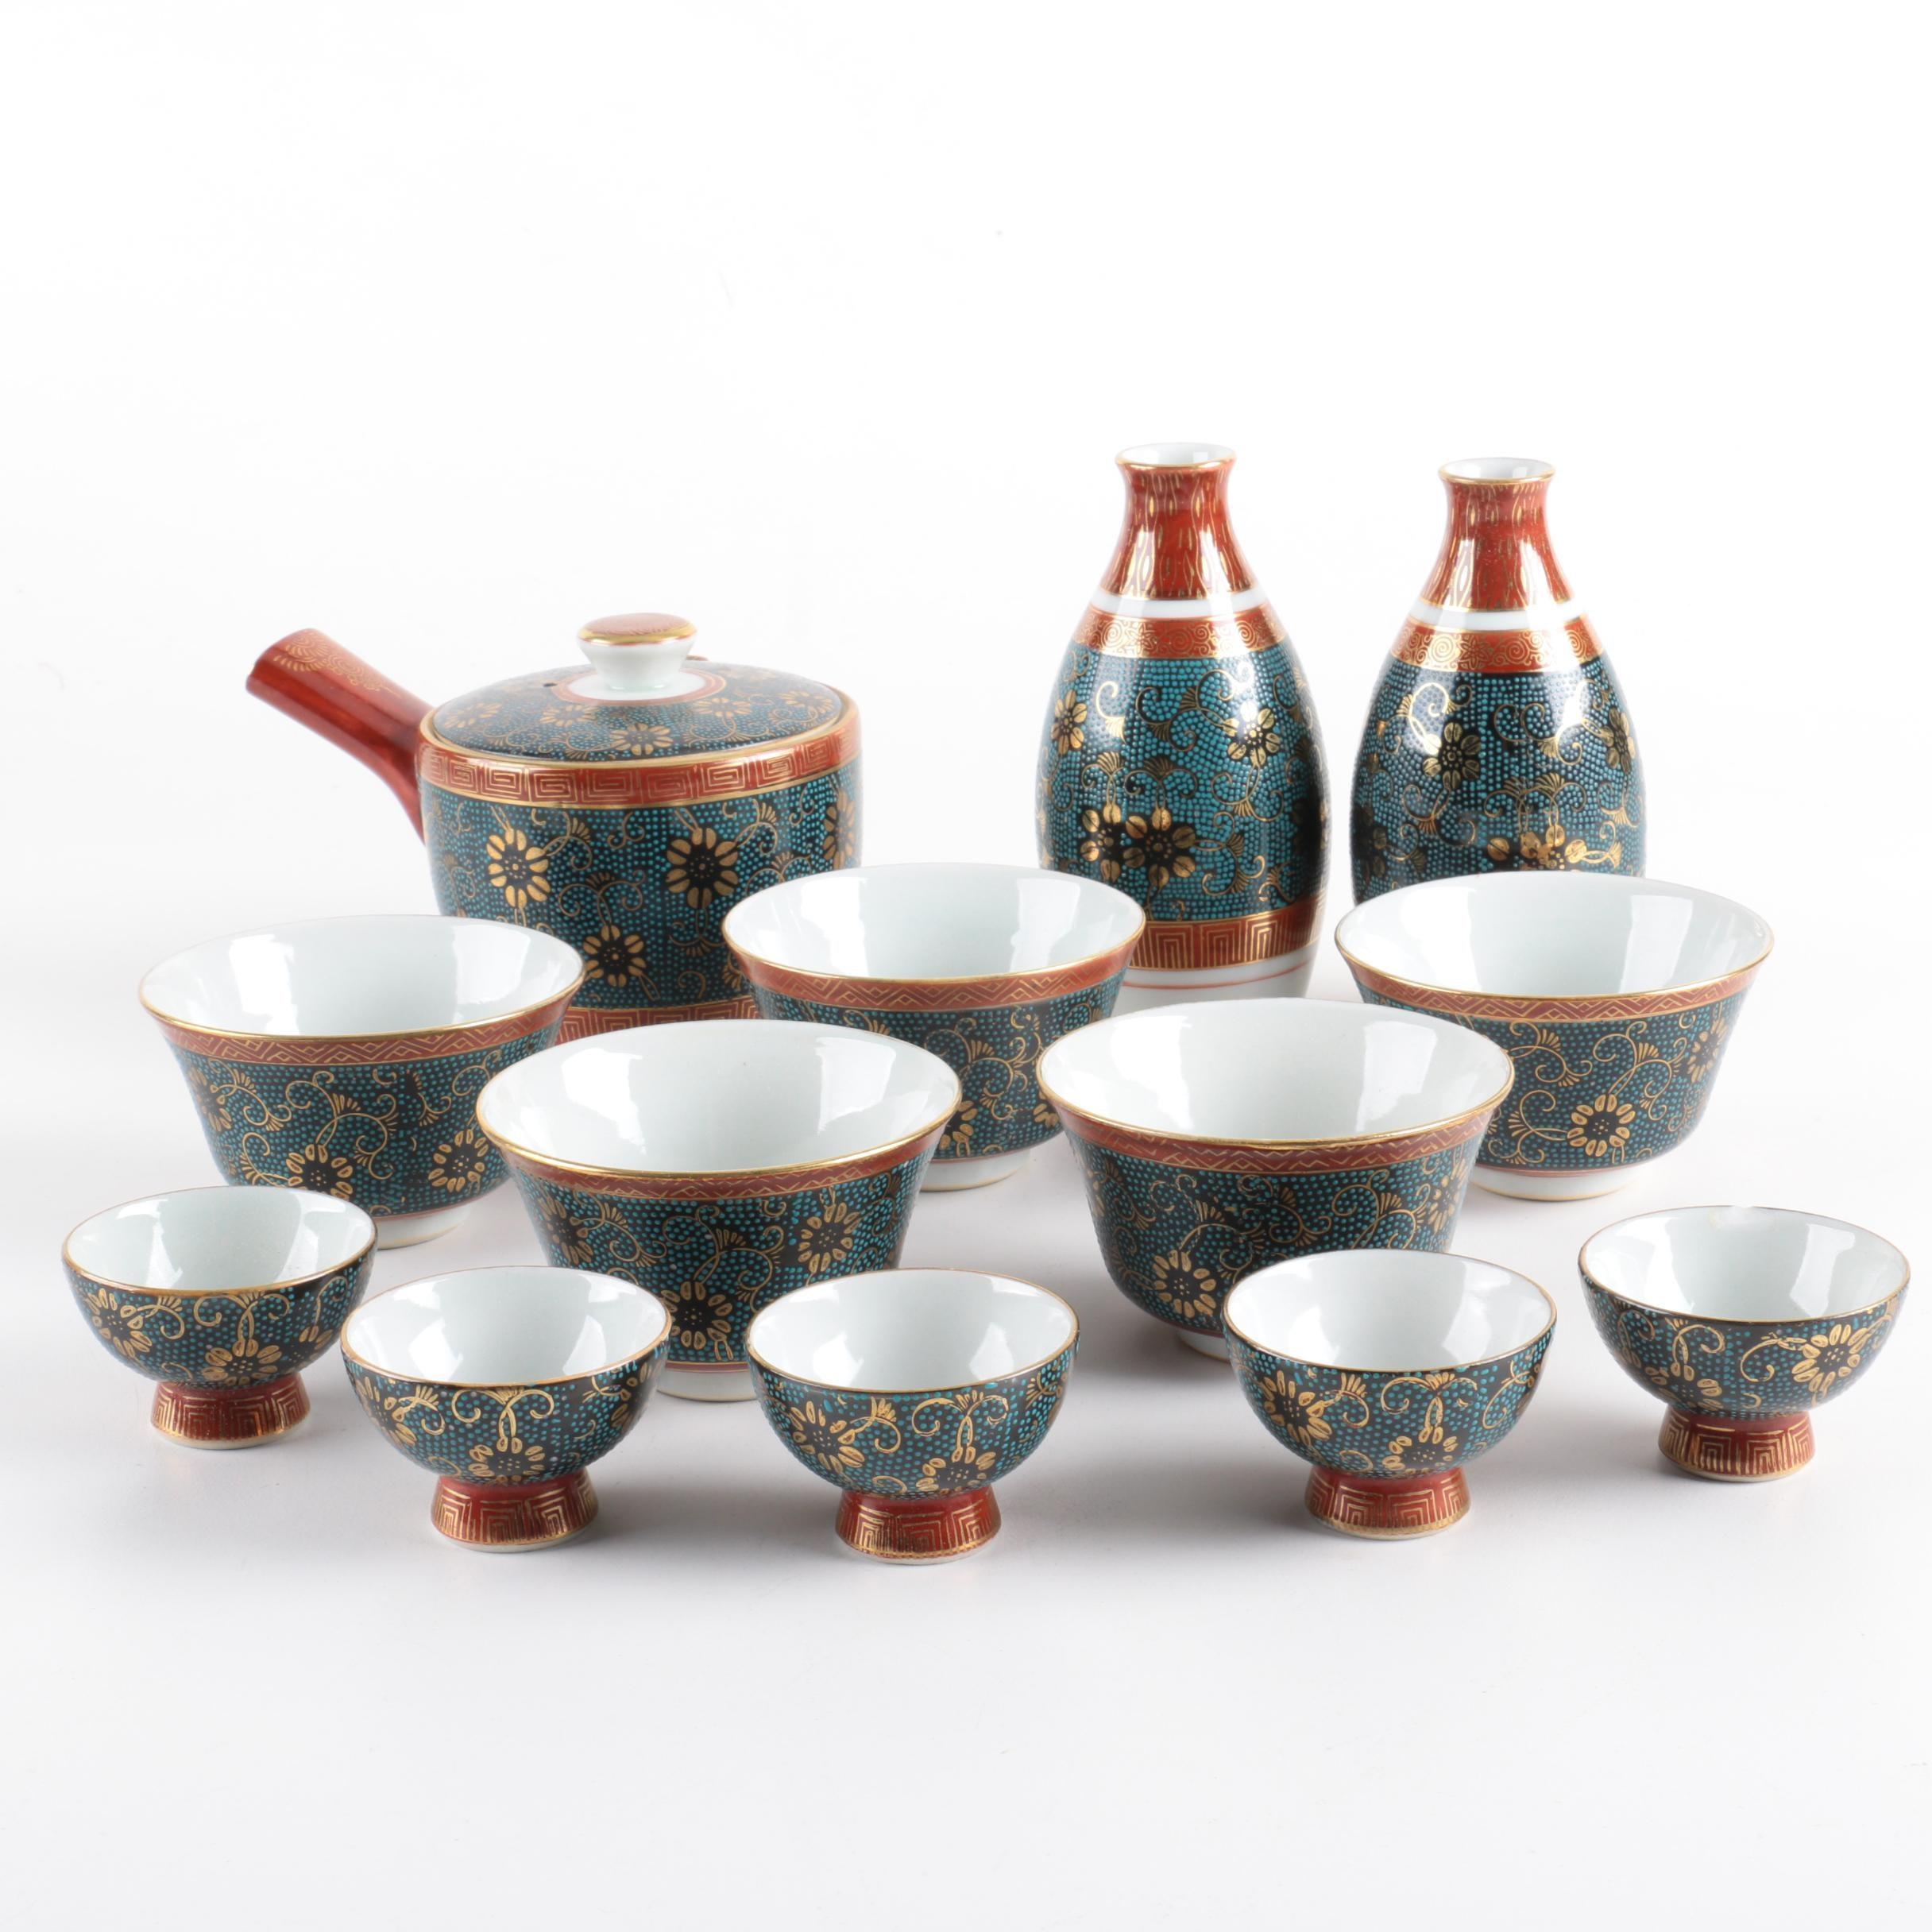 East Asian Style Porcelain Tableware